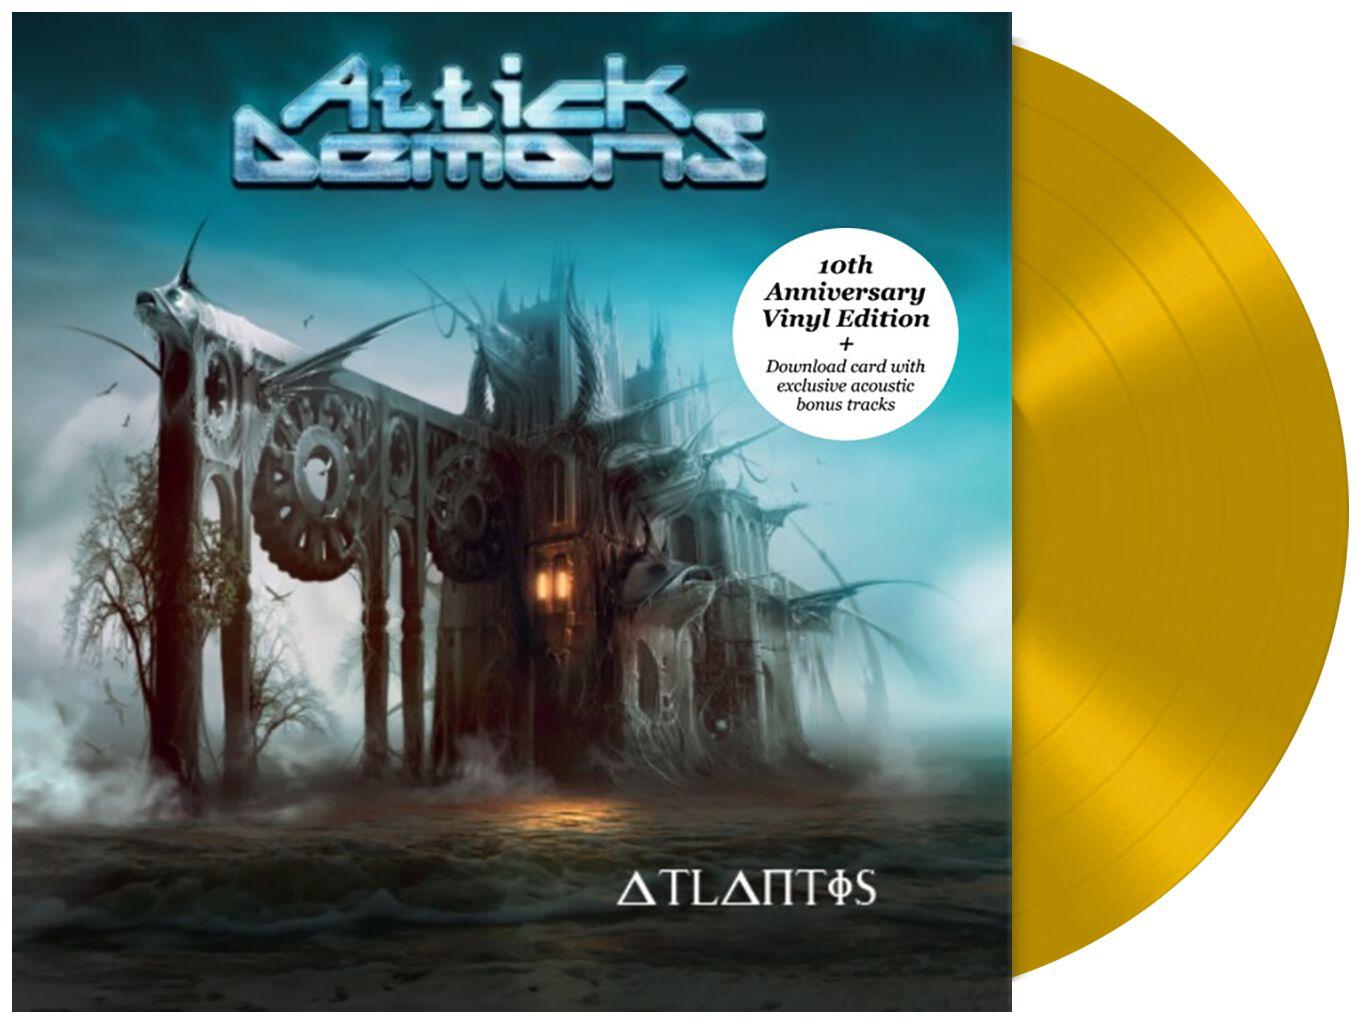 Image of Attick Demons Atlantis - 10 Year Anniversary LP goldfarben